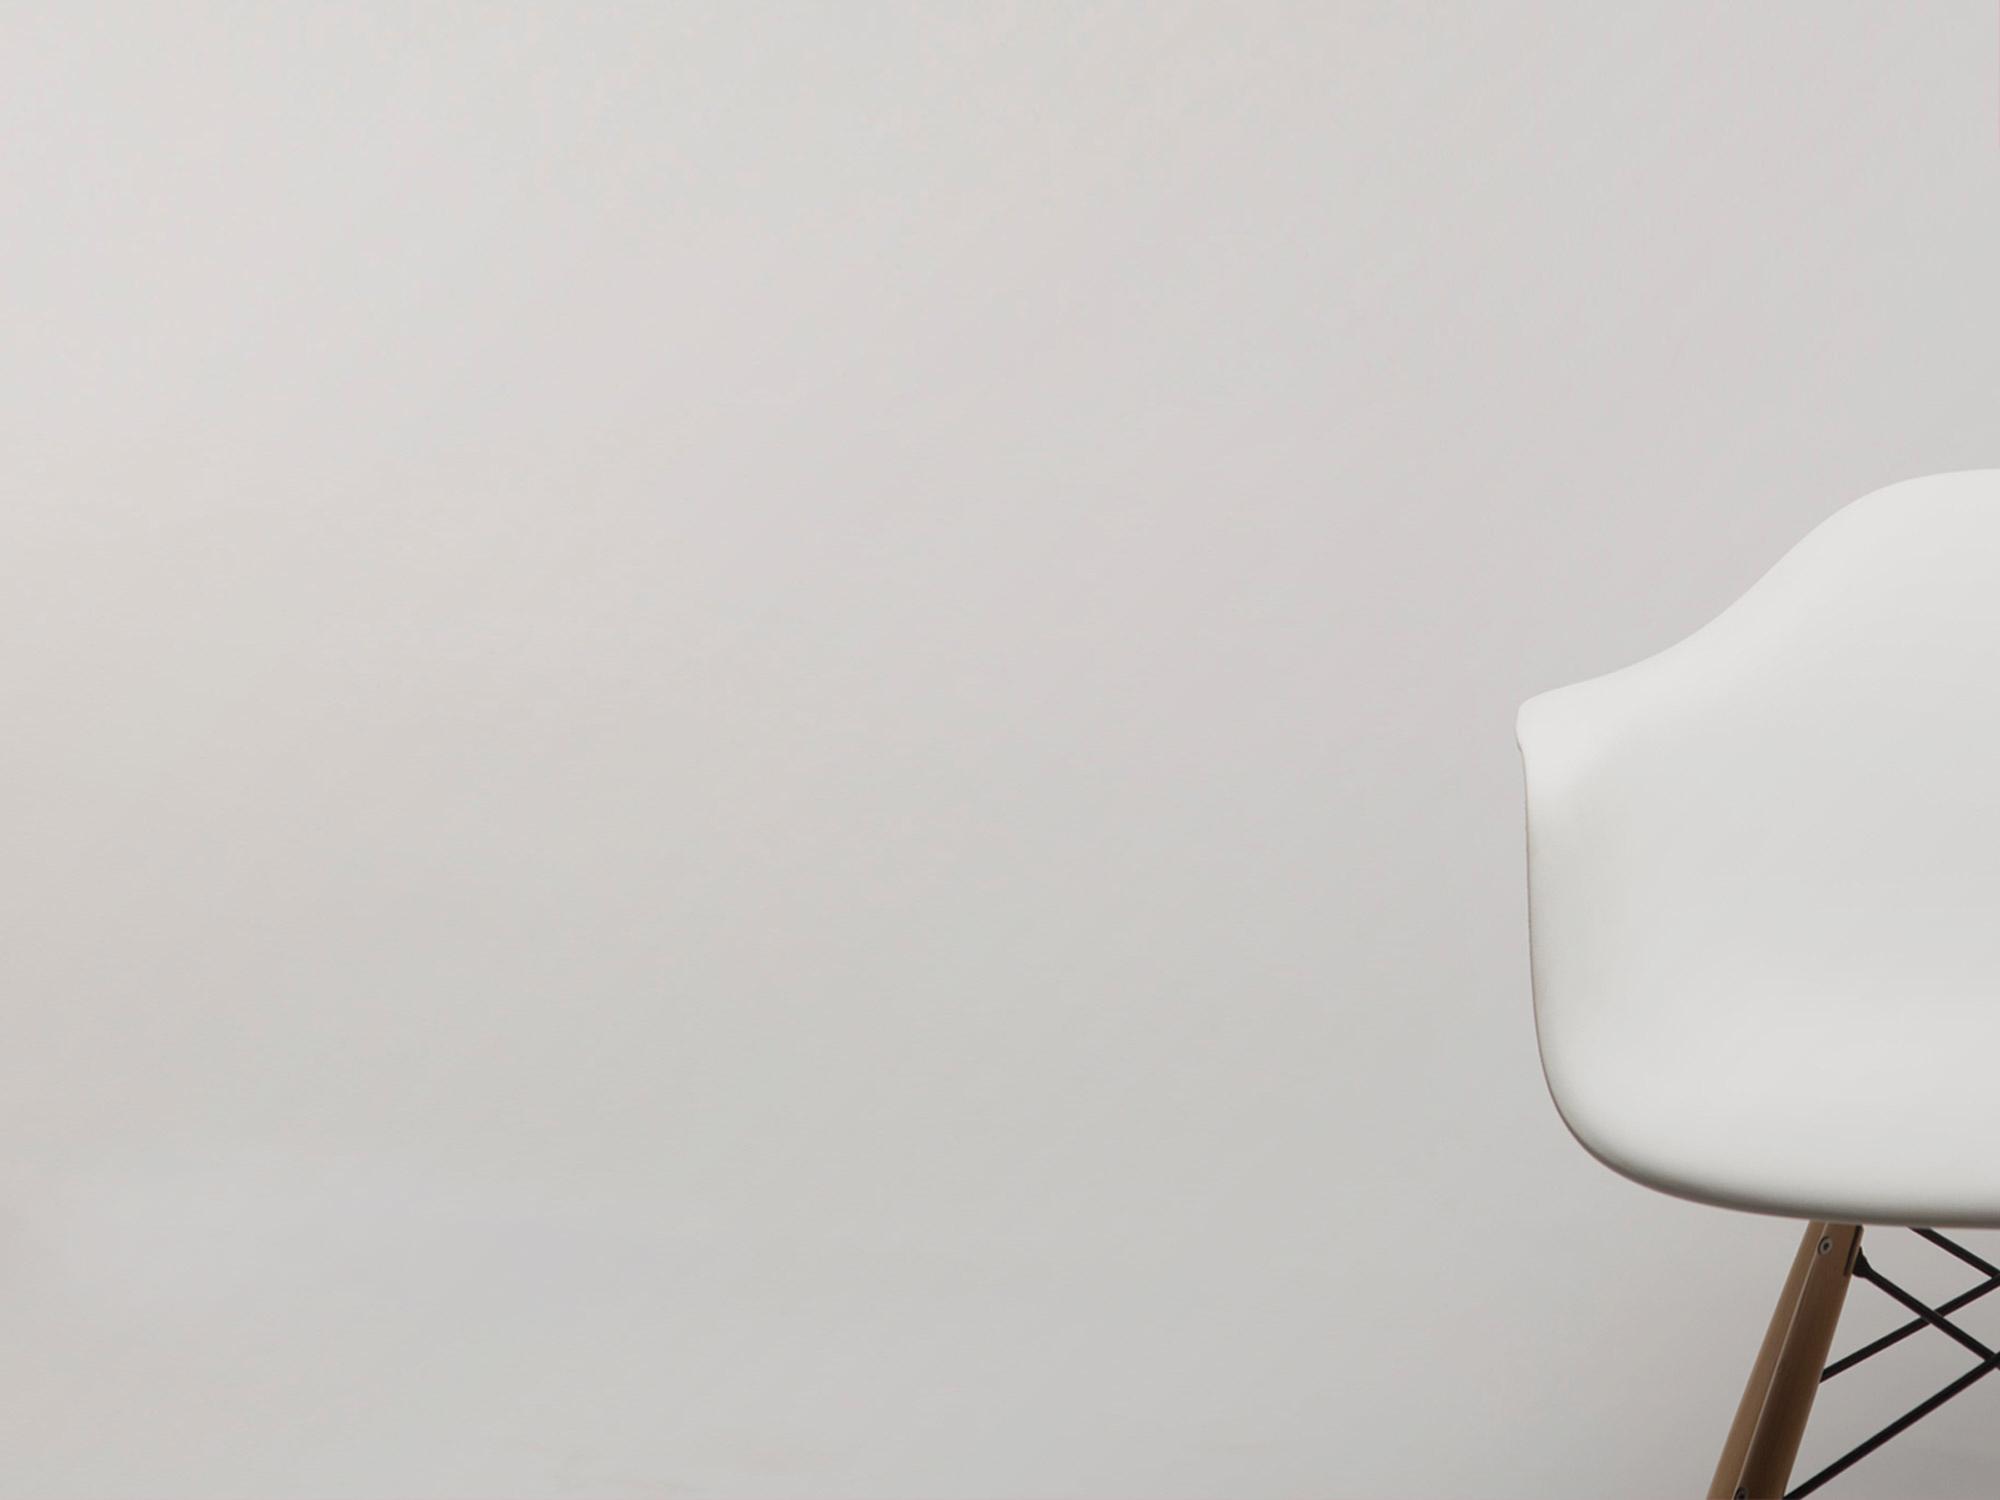 Senior UX Designer (m/w/d) – Wien